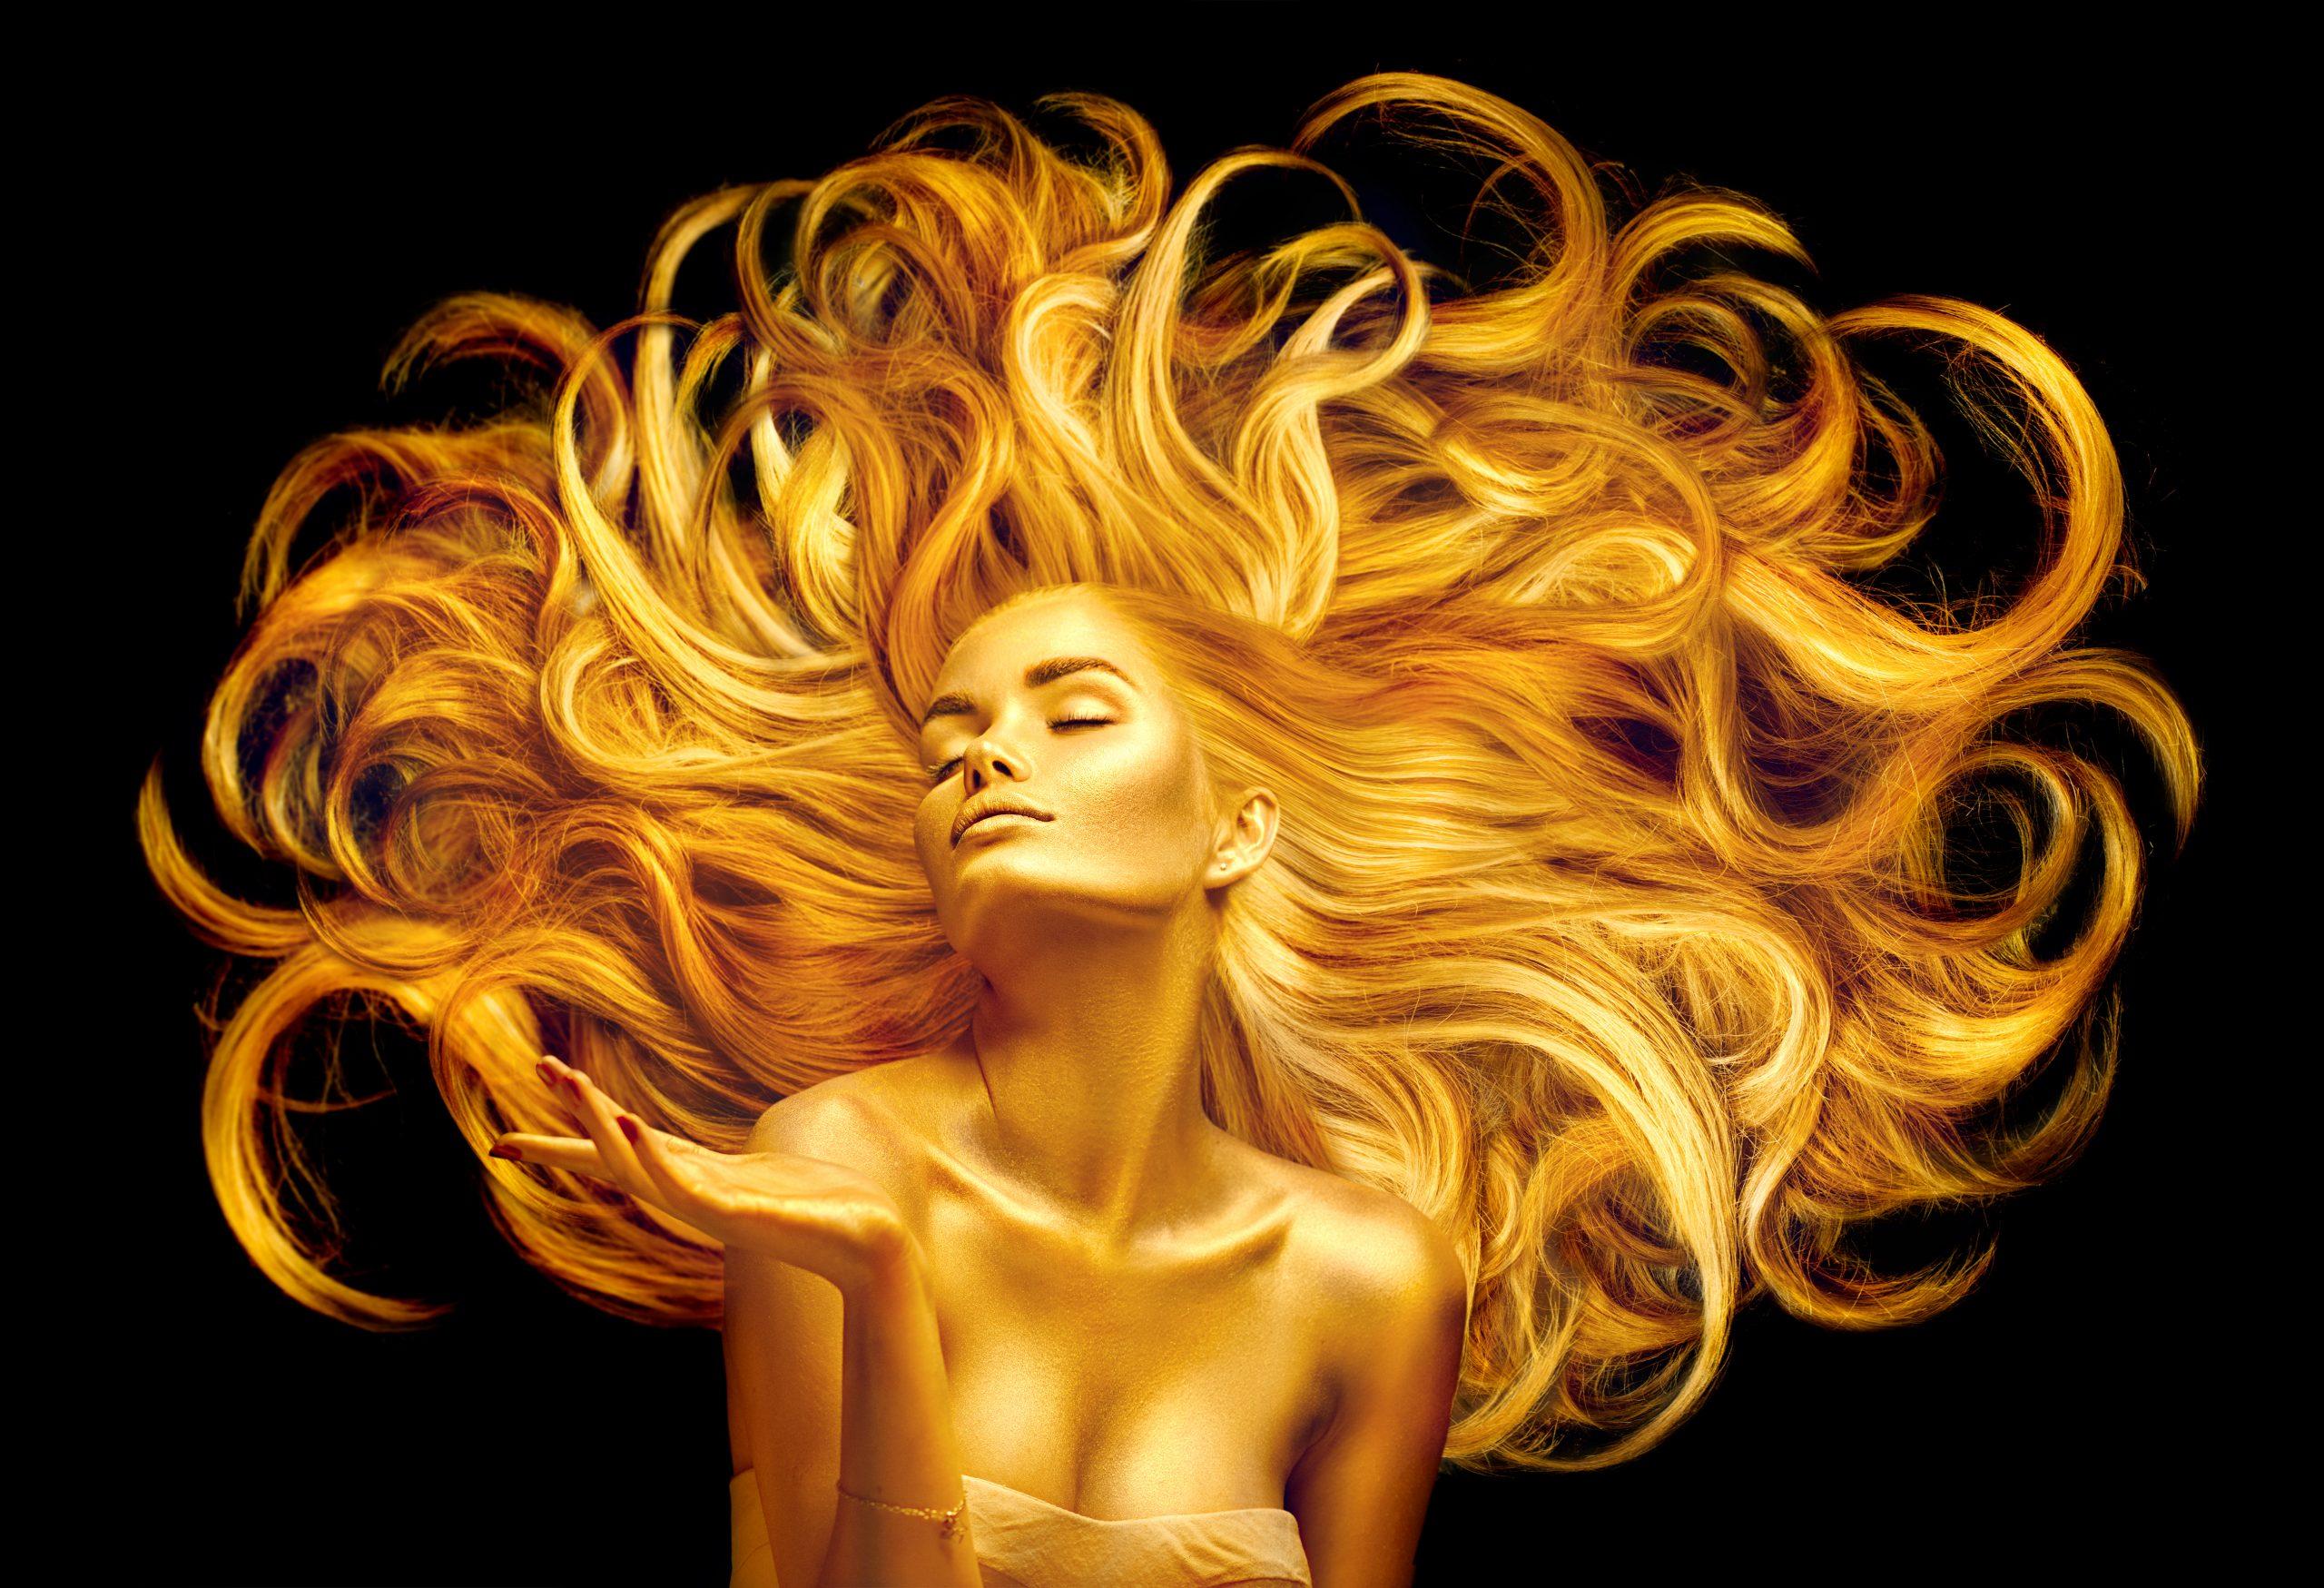 Golden Woman Black Background | Jack R. Hayes